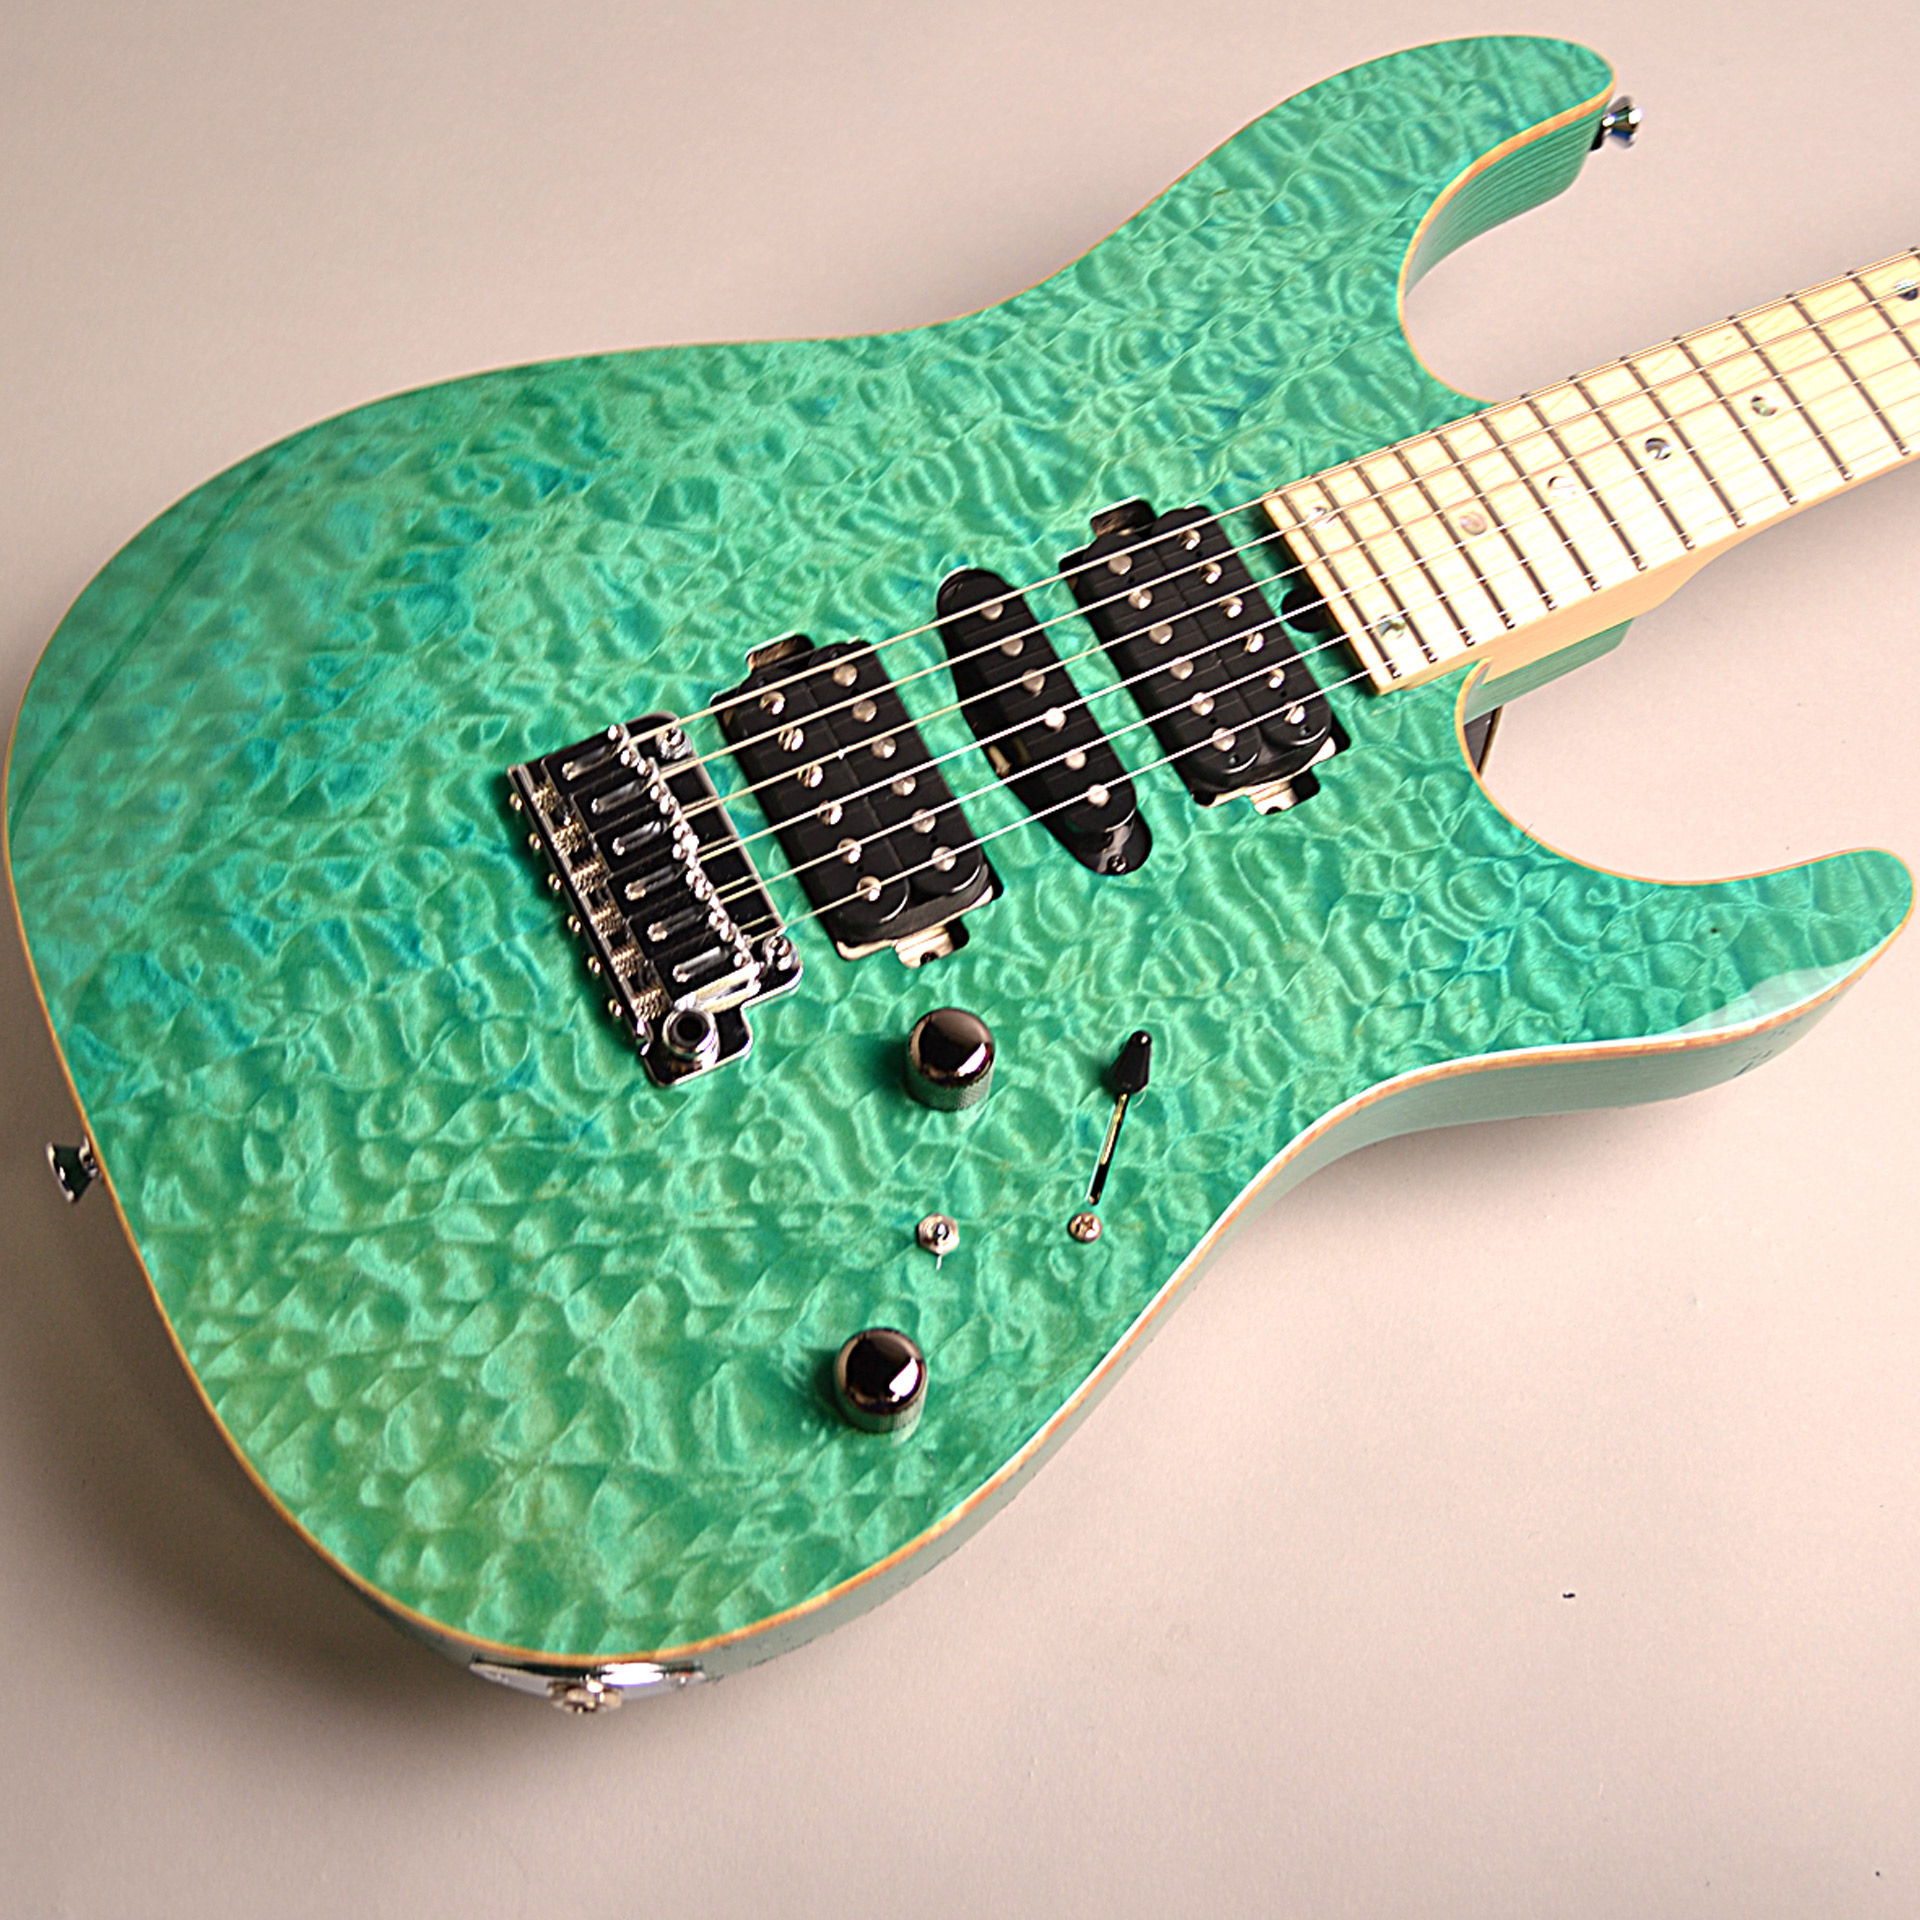 T's Guitars DST-PRO24 Maple (BoraBoraBlue)のボディトップ-アップ画像